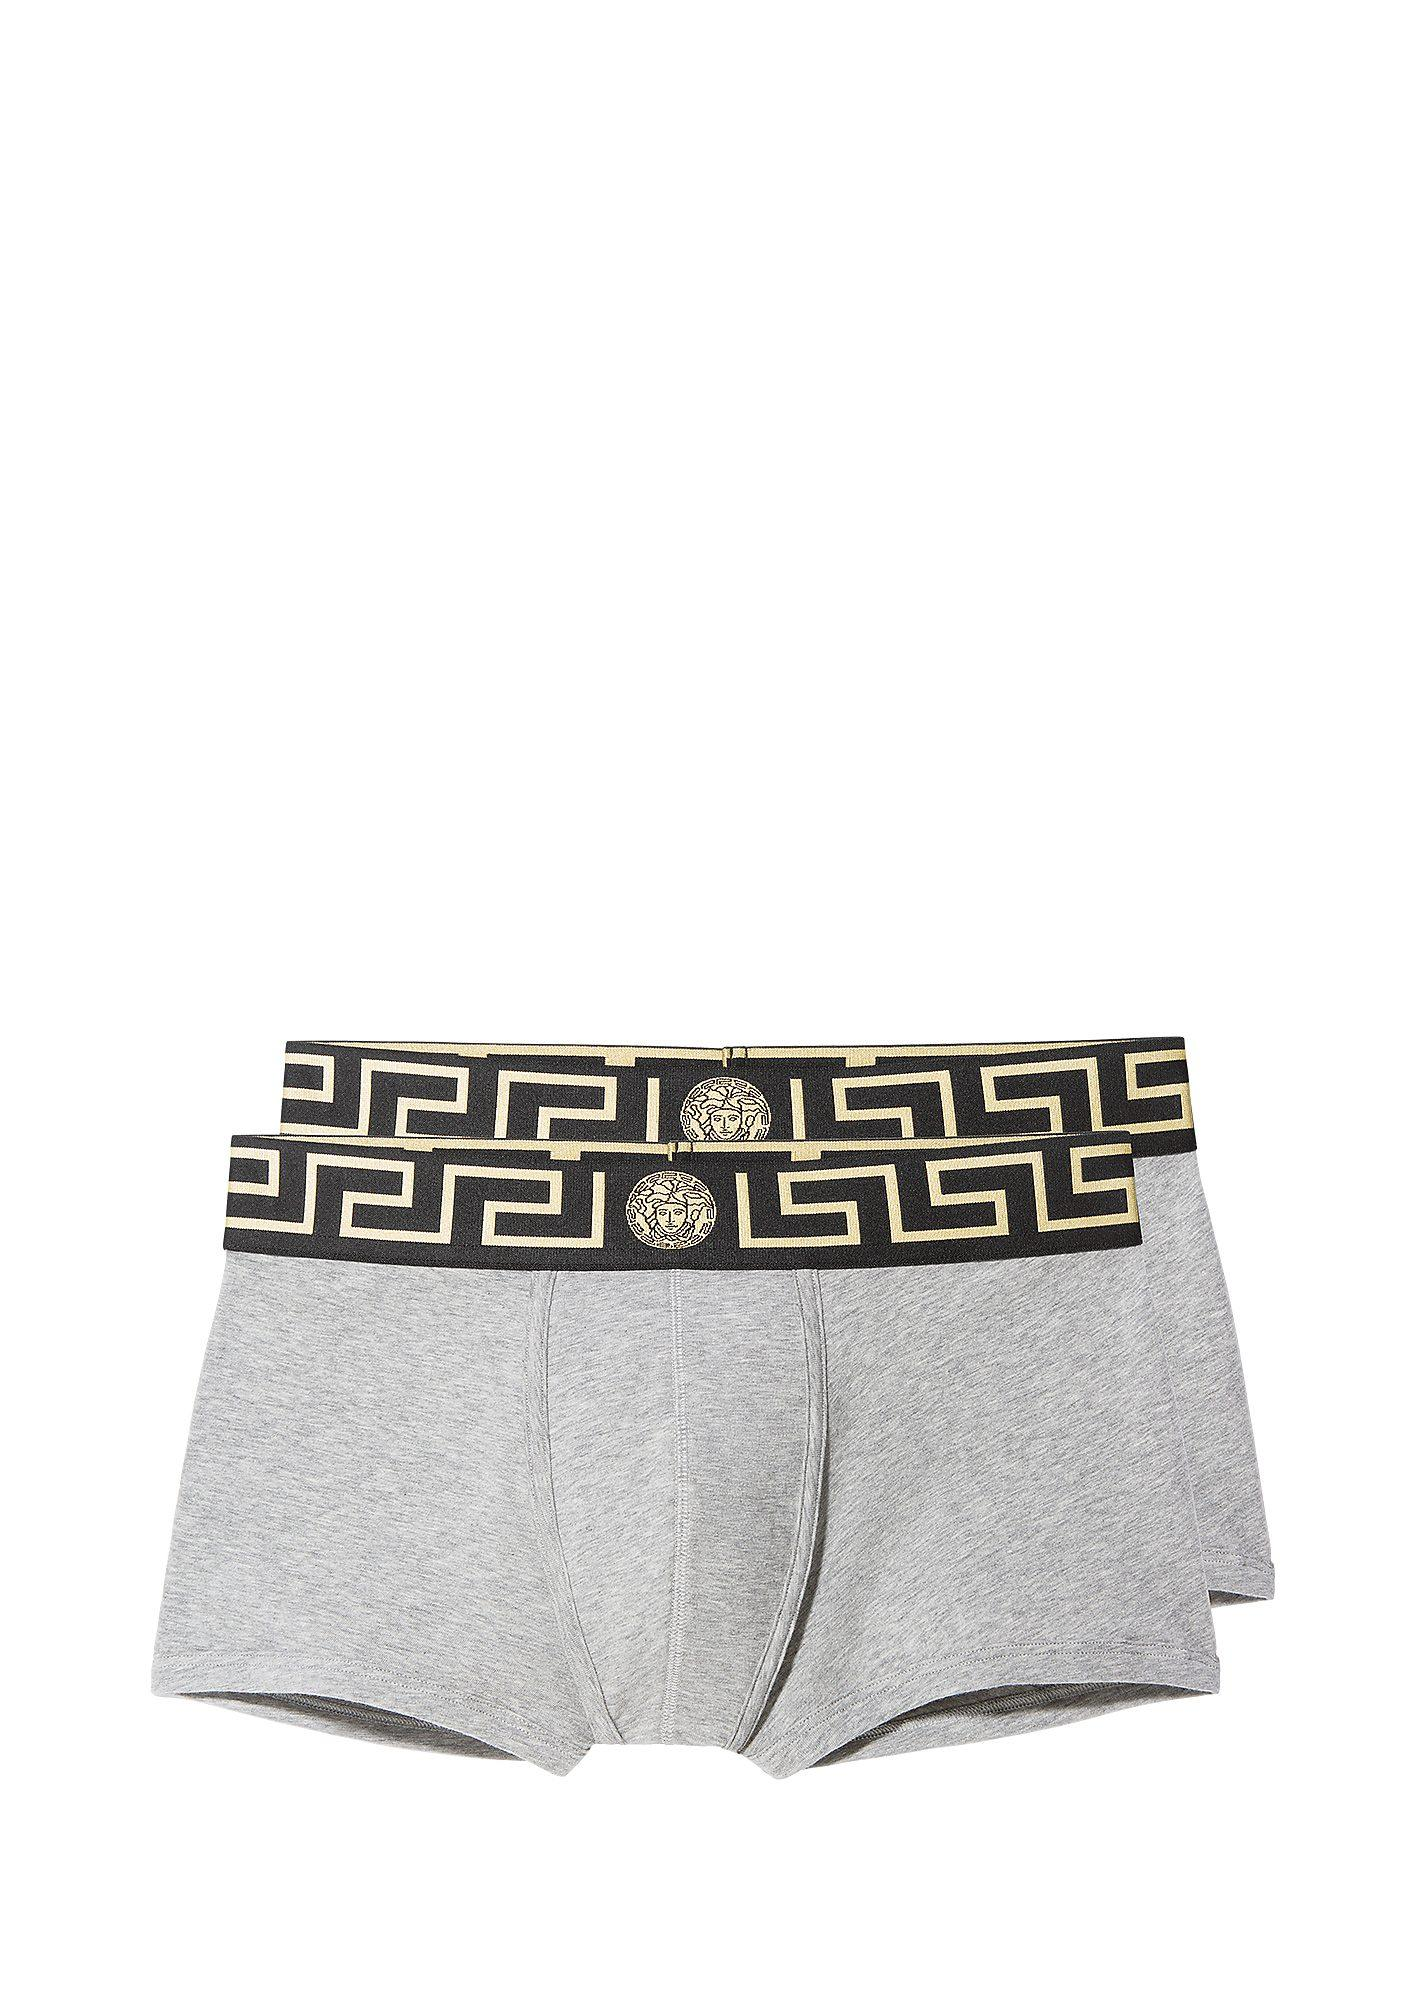 f94480321c64 Versace Boxer Brief Bi-Pack In Gray Gold Greca | ModeSens